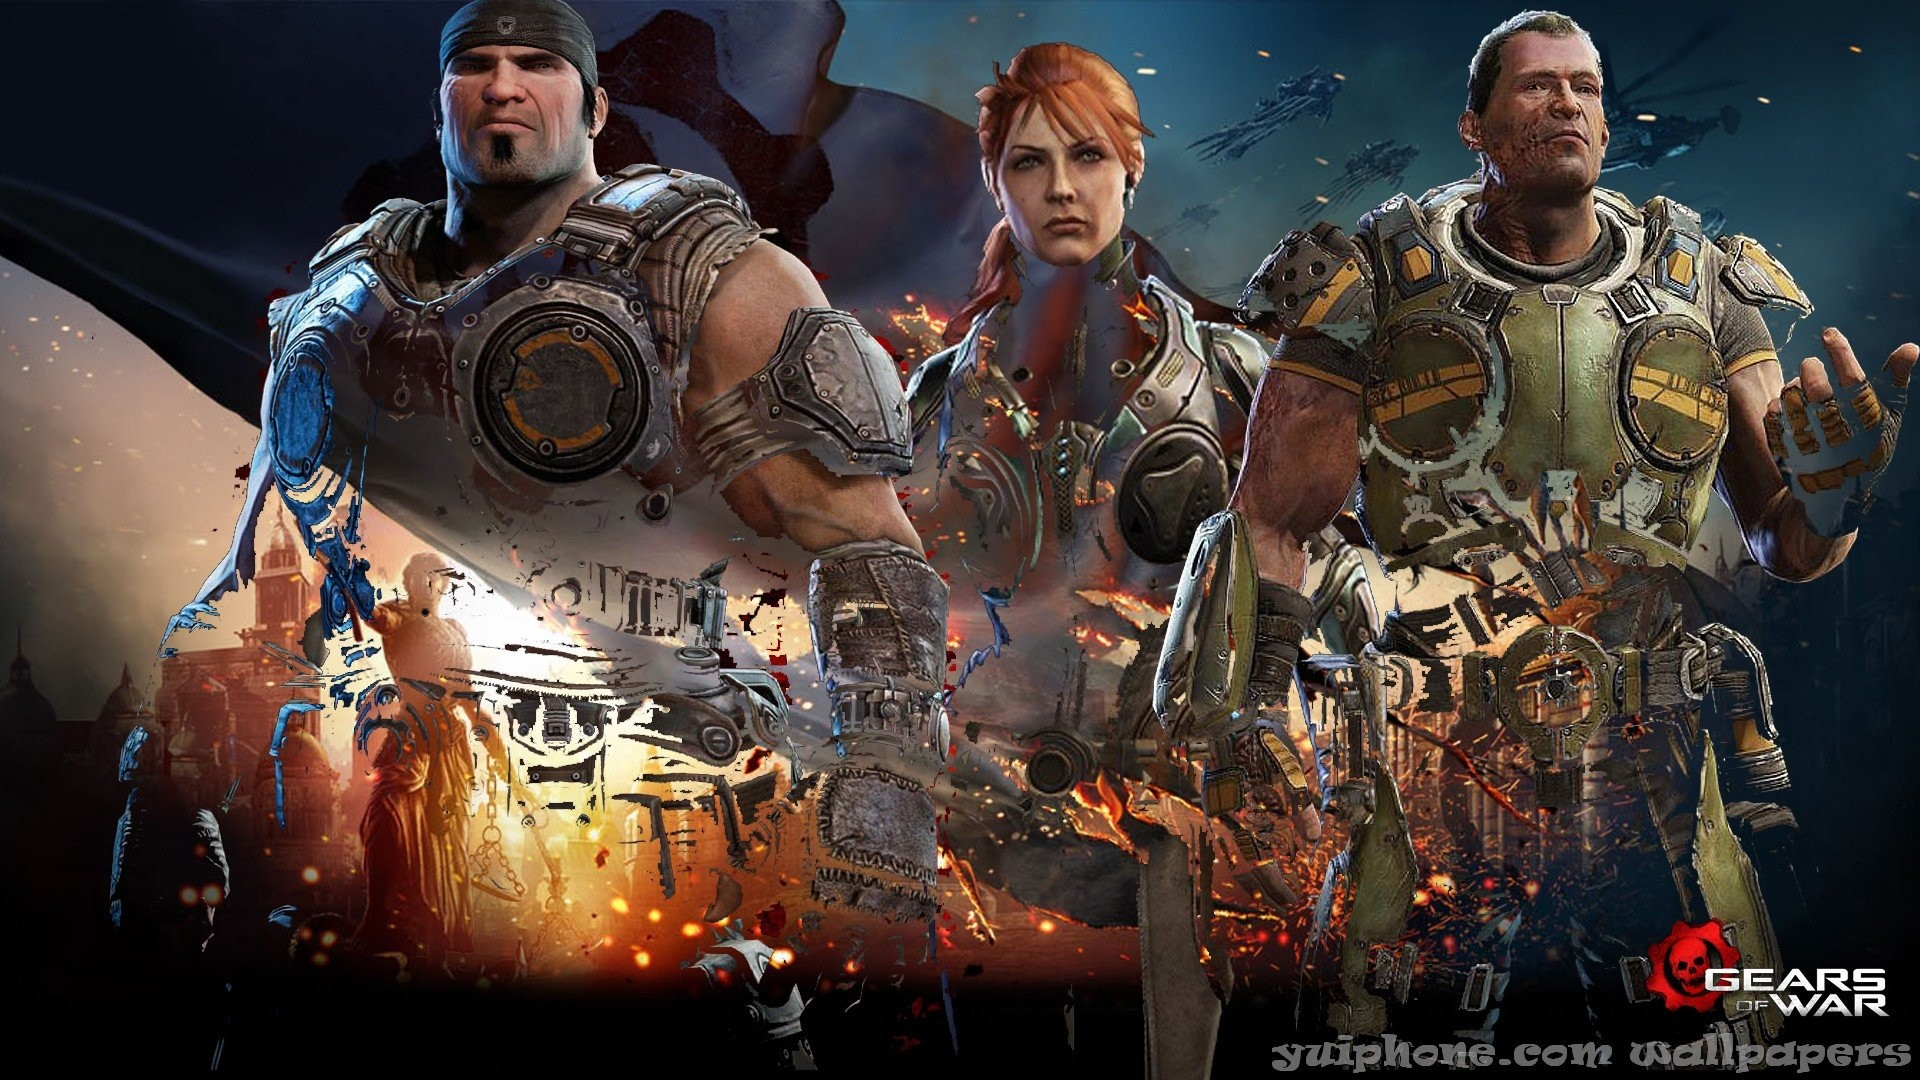 Gears of War Judgment Wallpaper (76+ images)